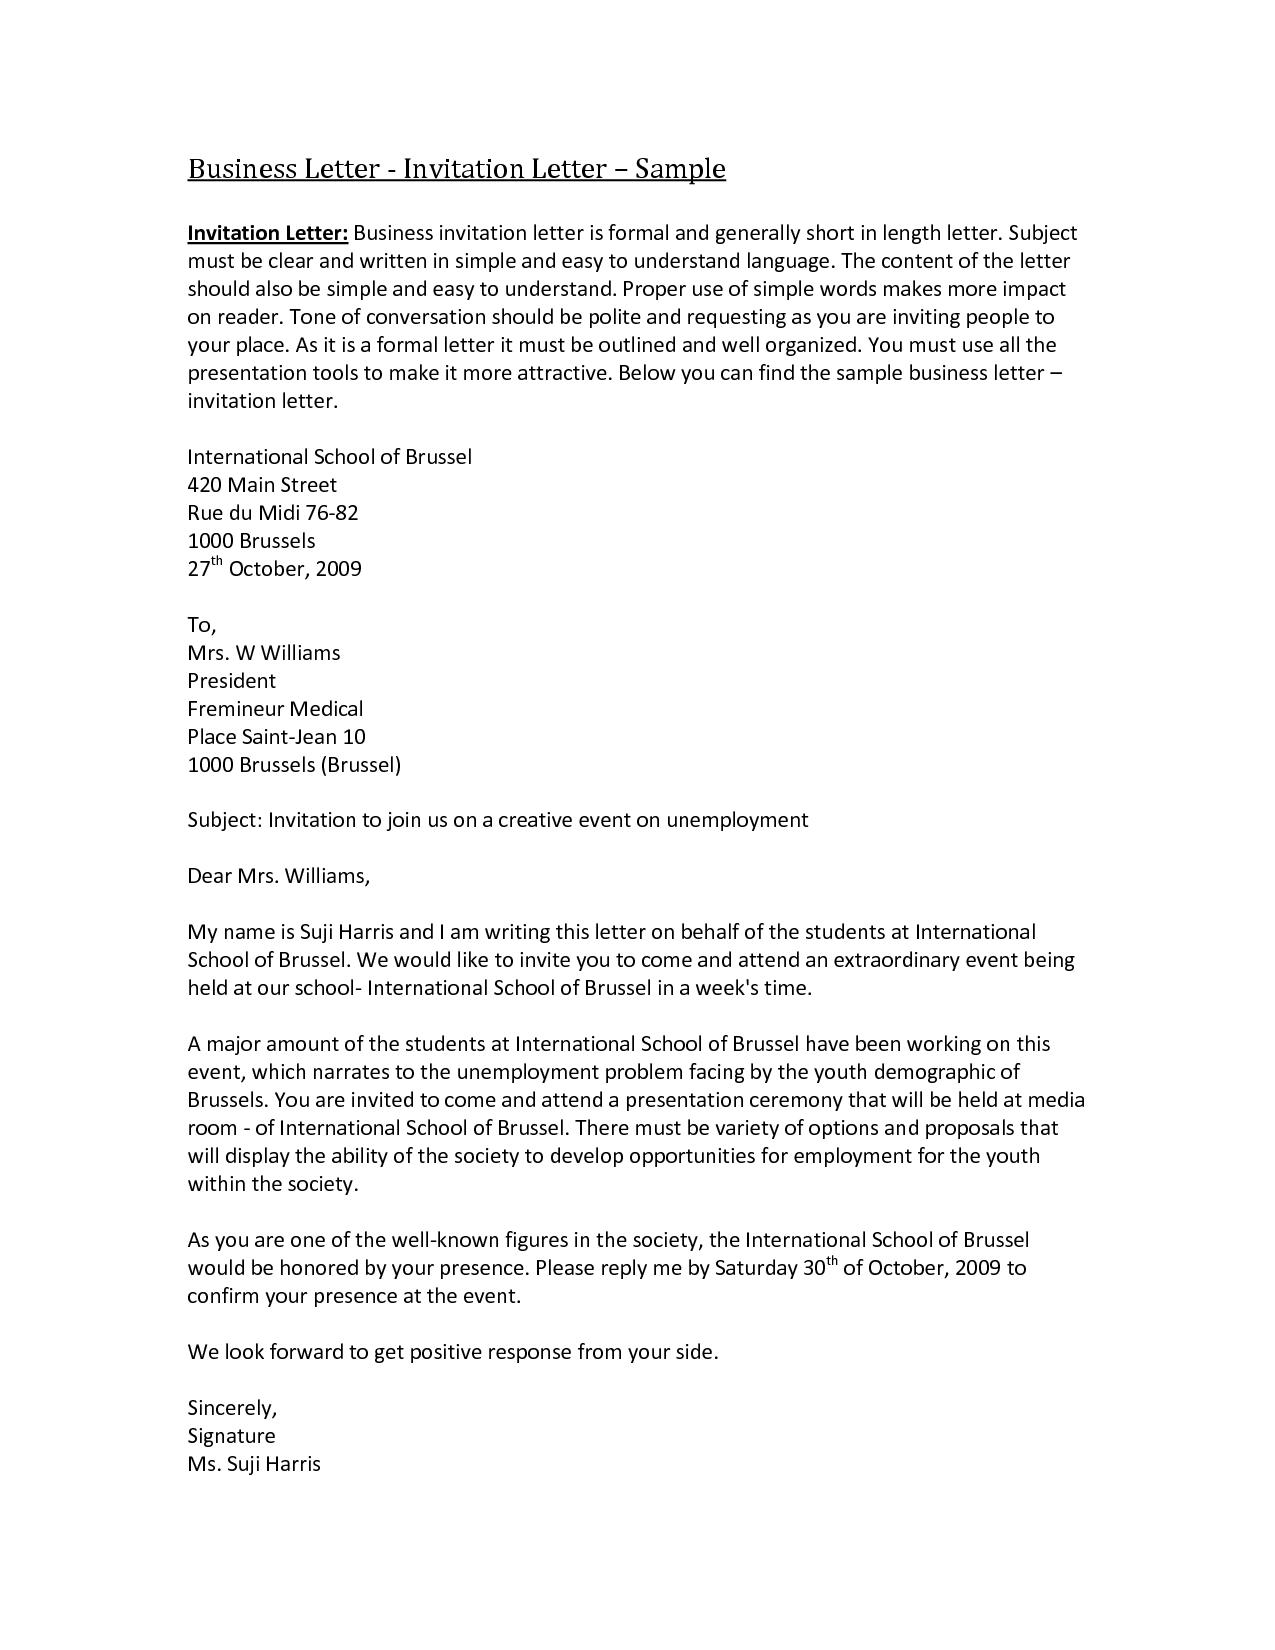 Letter business invitation sample letters writing professional letter business invitation sample letters writing professional best free home design idea inspiration stopboris Choice Image